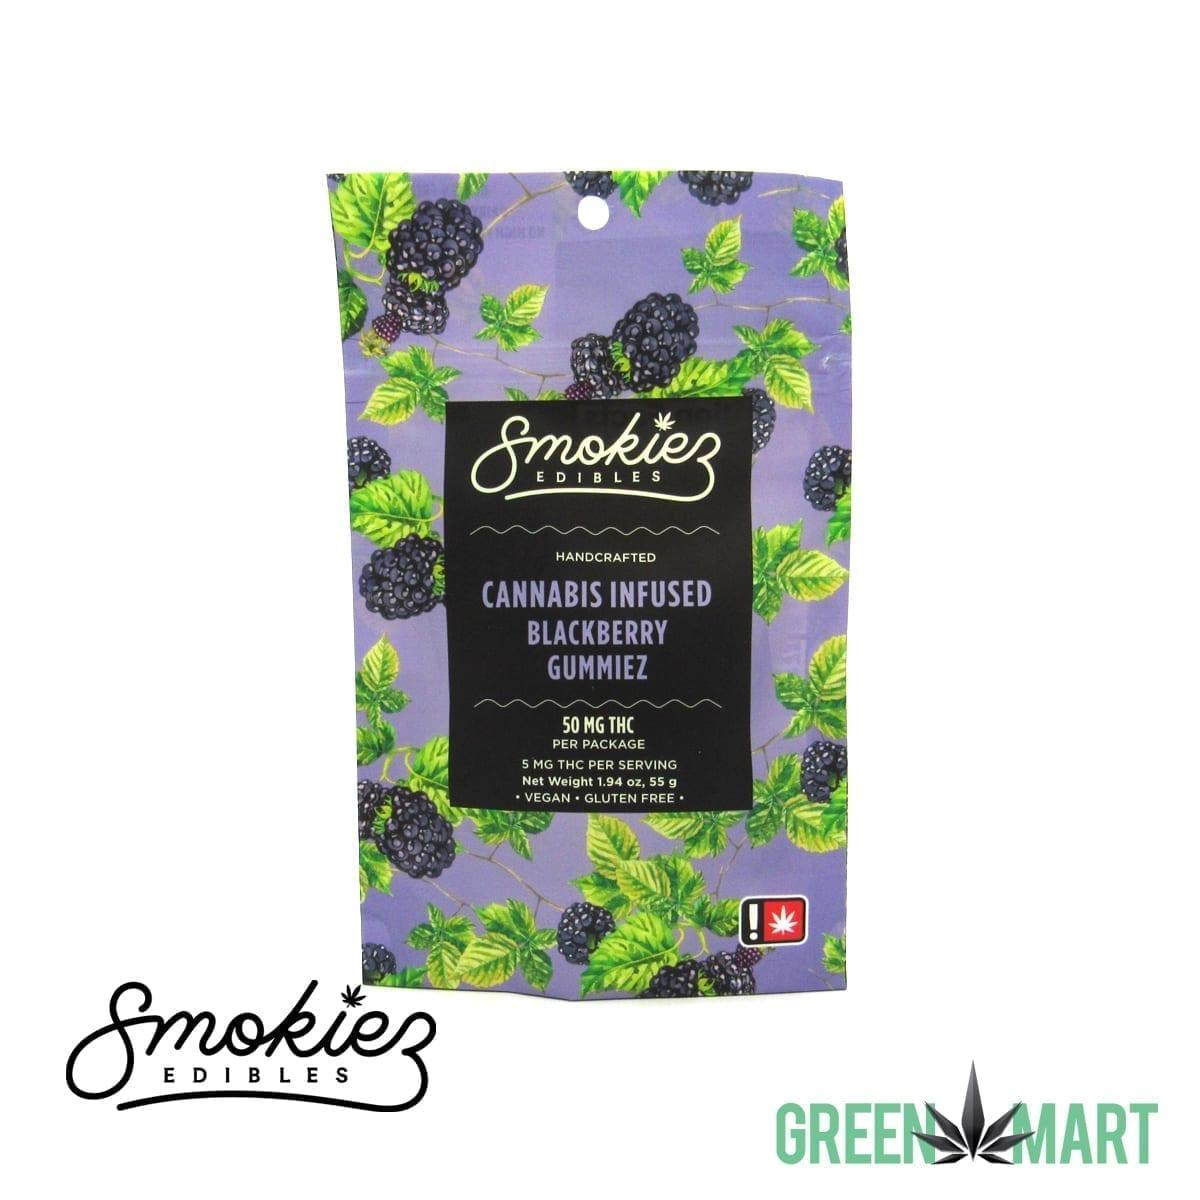 Smokiez Edibles - New Blackberry THC